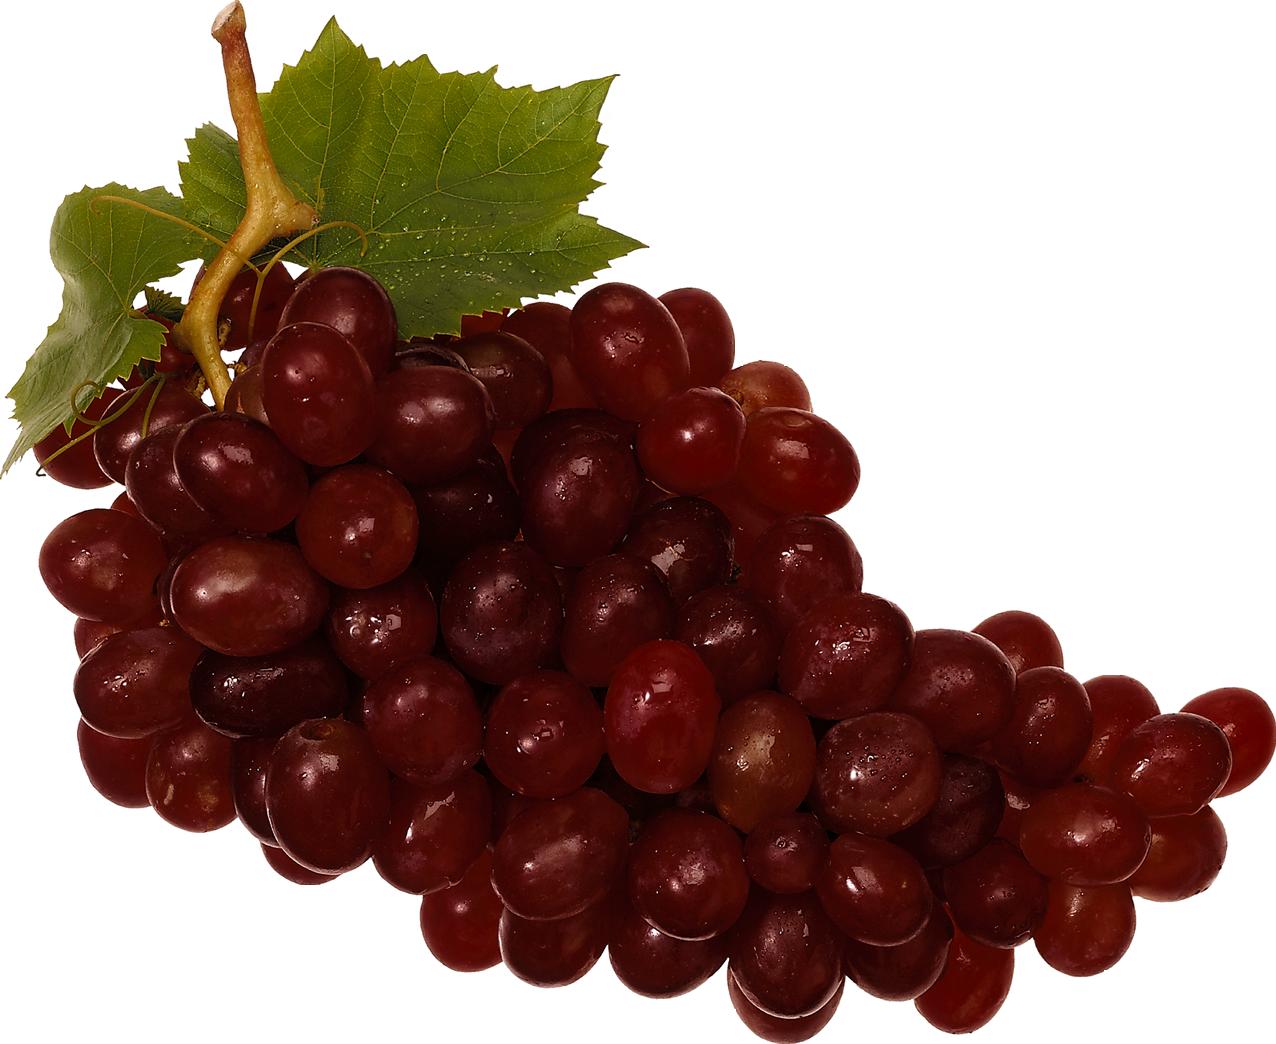 Grapes red grape